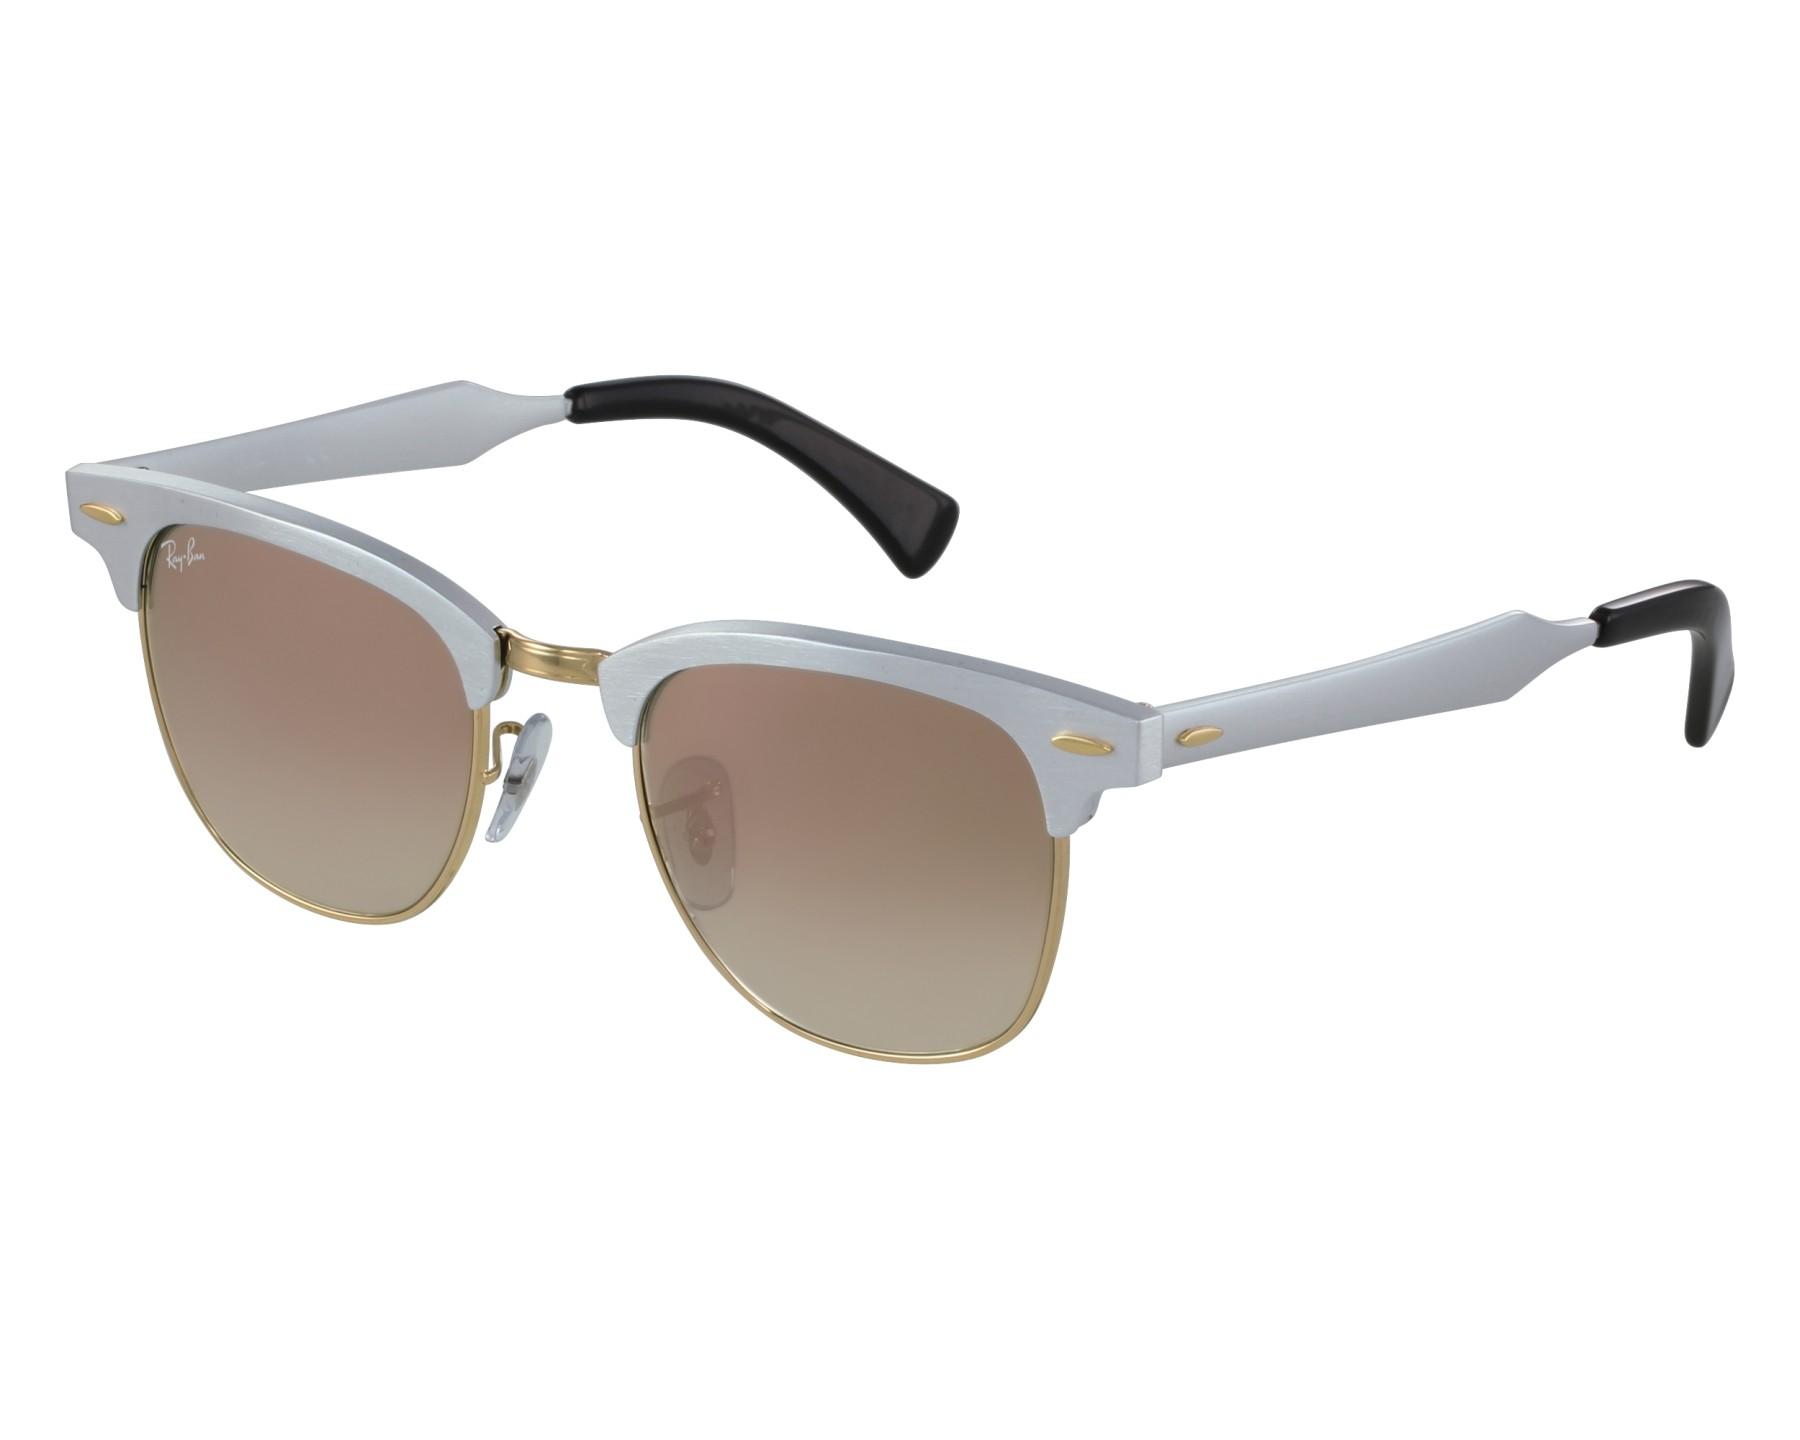 e5b3710924083 ... ireland sunglasses ray ban rb 3507 137 7o 49 21 silver gold front d2cc2  66dd8